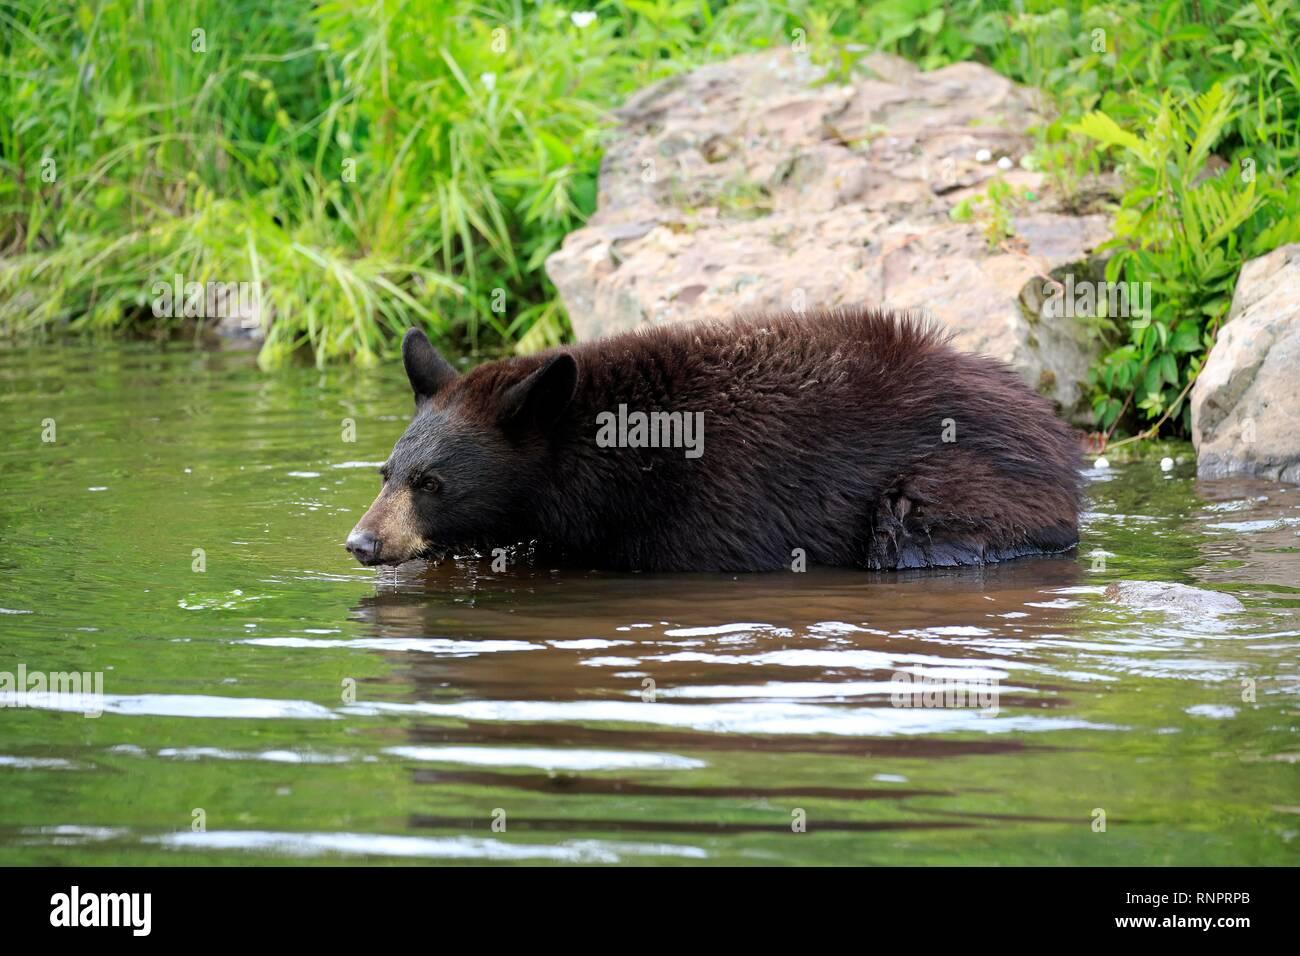 Oso negro americano (Ursus americanus), joven animal en agua, Pine County, Minnesota, EE.UU. Foto de stock